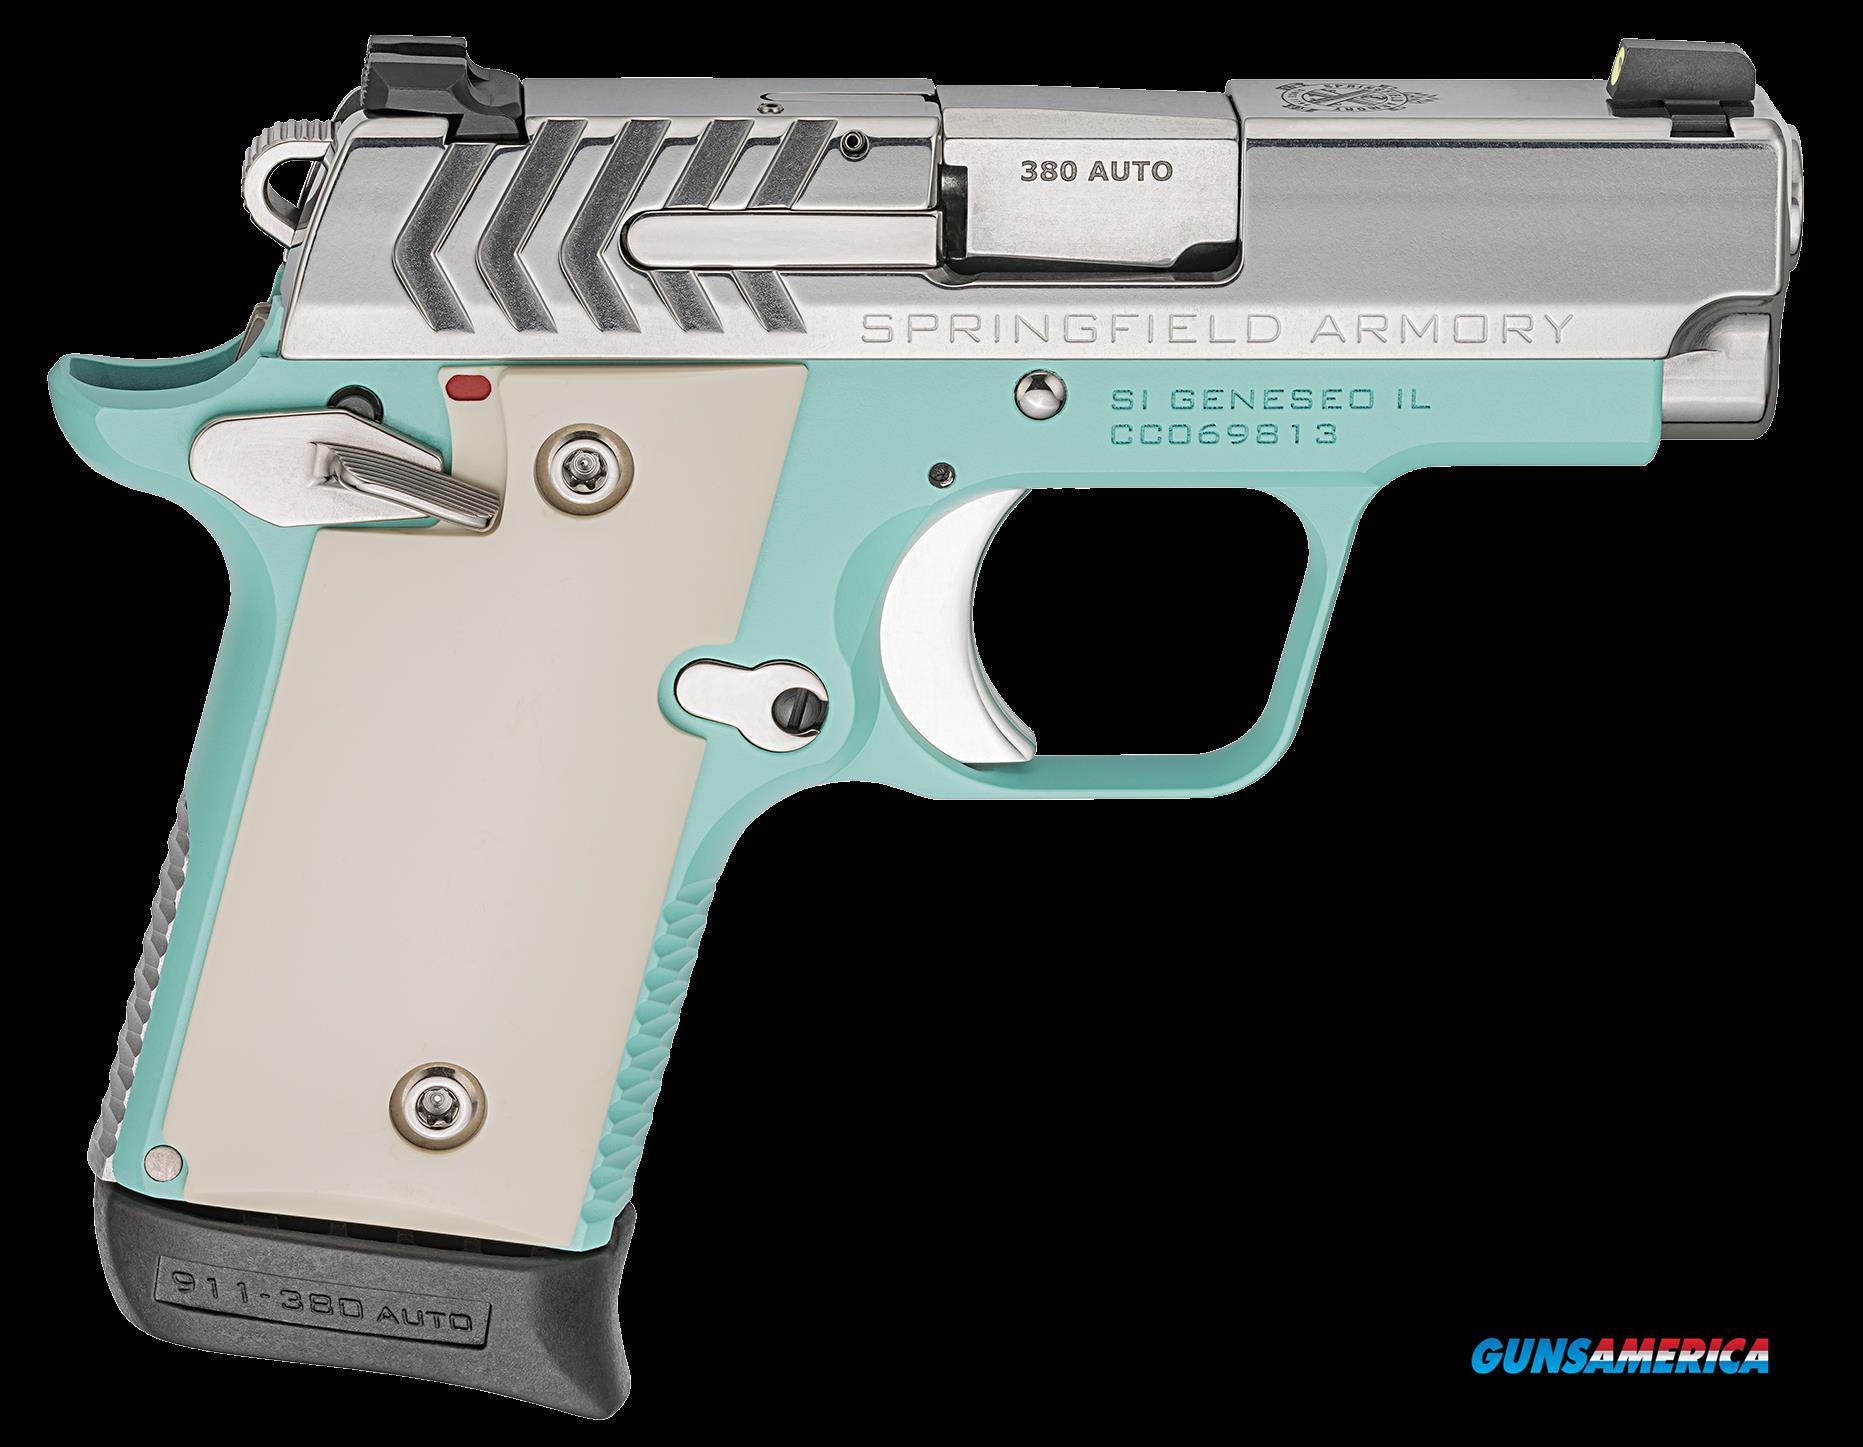 Springfield Armory 911, Spg Pg9109vbs     380 911 2.7 Vntg Blue Ss   6-7r  Guns > Pistols > 1911 Pistol Copies (non-Colt)